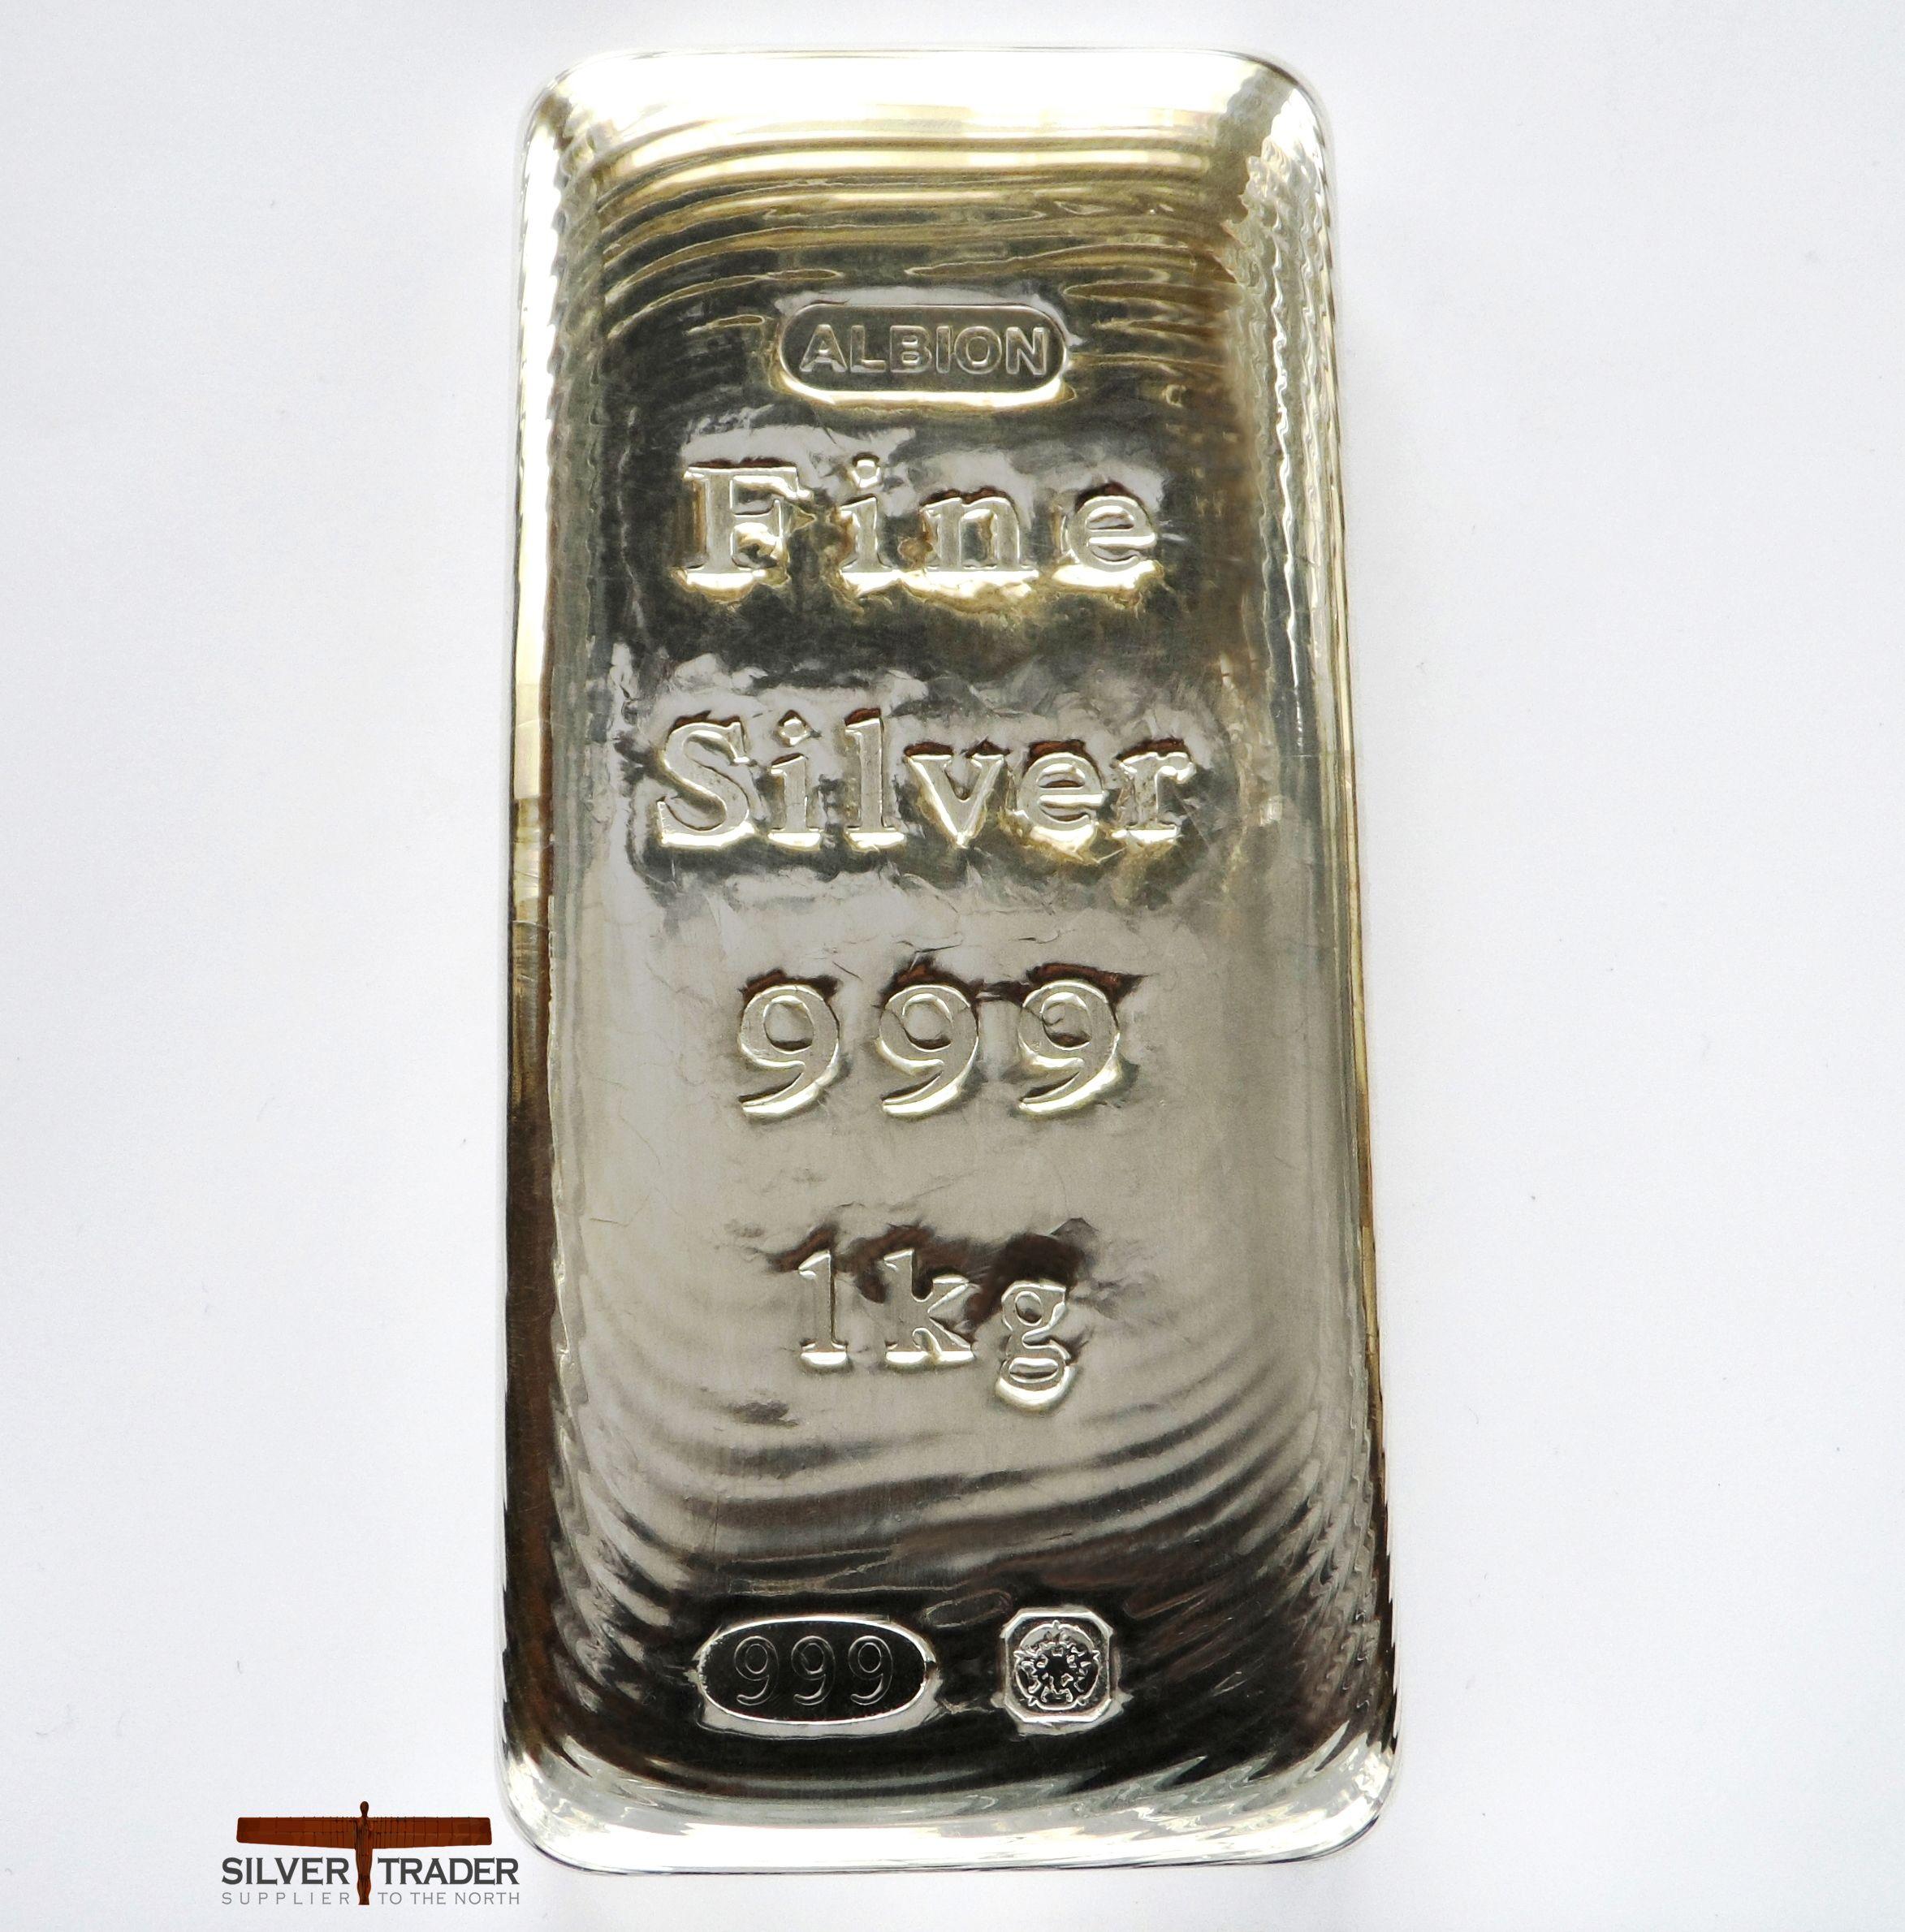 2018 Albion 1 Kilo Sheffield Hallmarked Silver Bullion Bar Gold Bullion Bars Silver Bullion Silver Bullion Coins